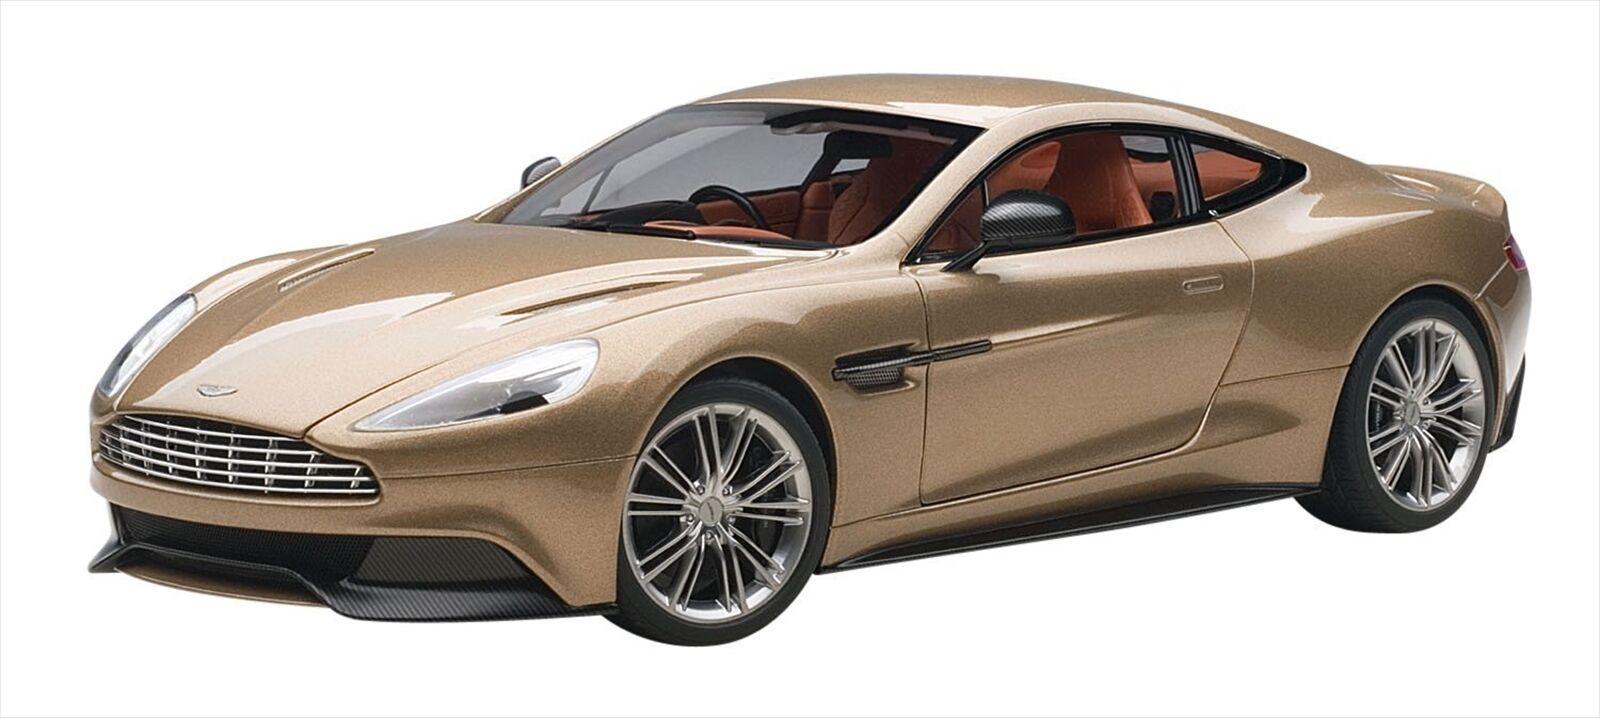 AUTOart 1/18 Aston Martin Vanquish 2015 Bronze Diecast Model 70248